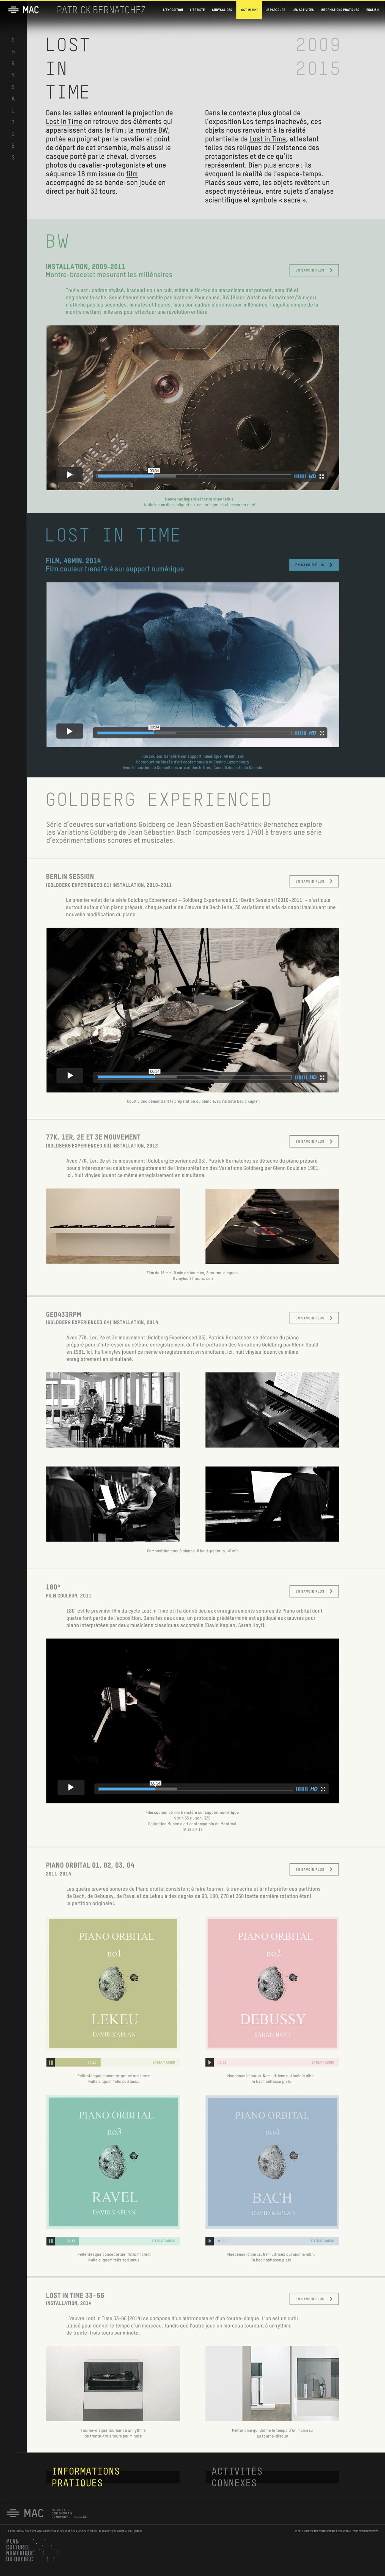 creative Web interactive art museum